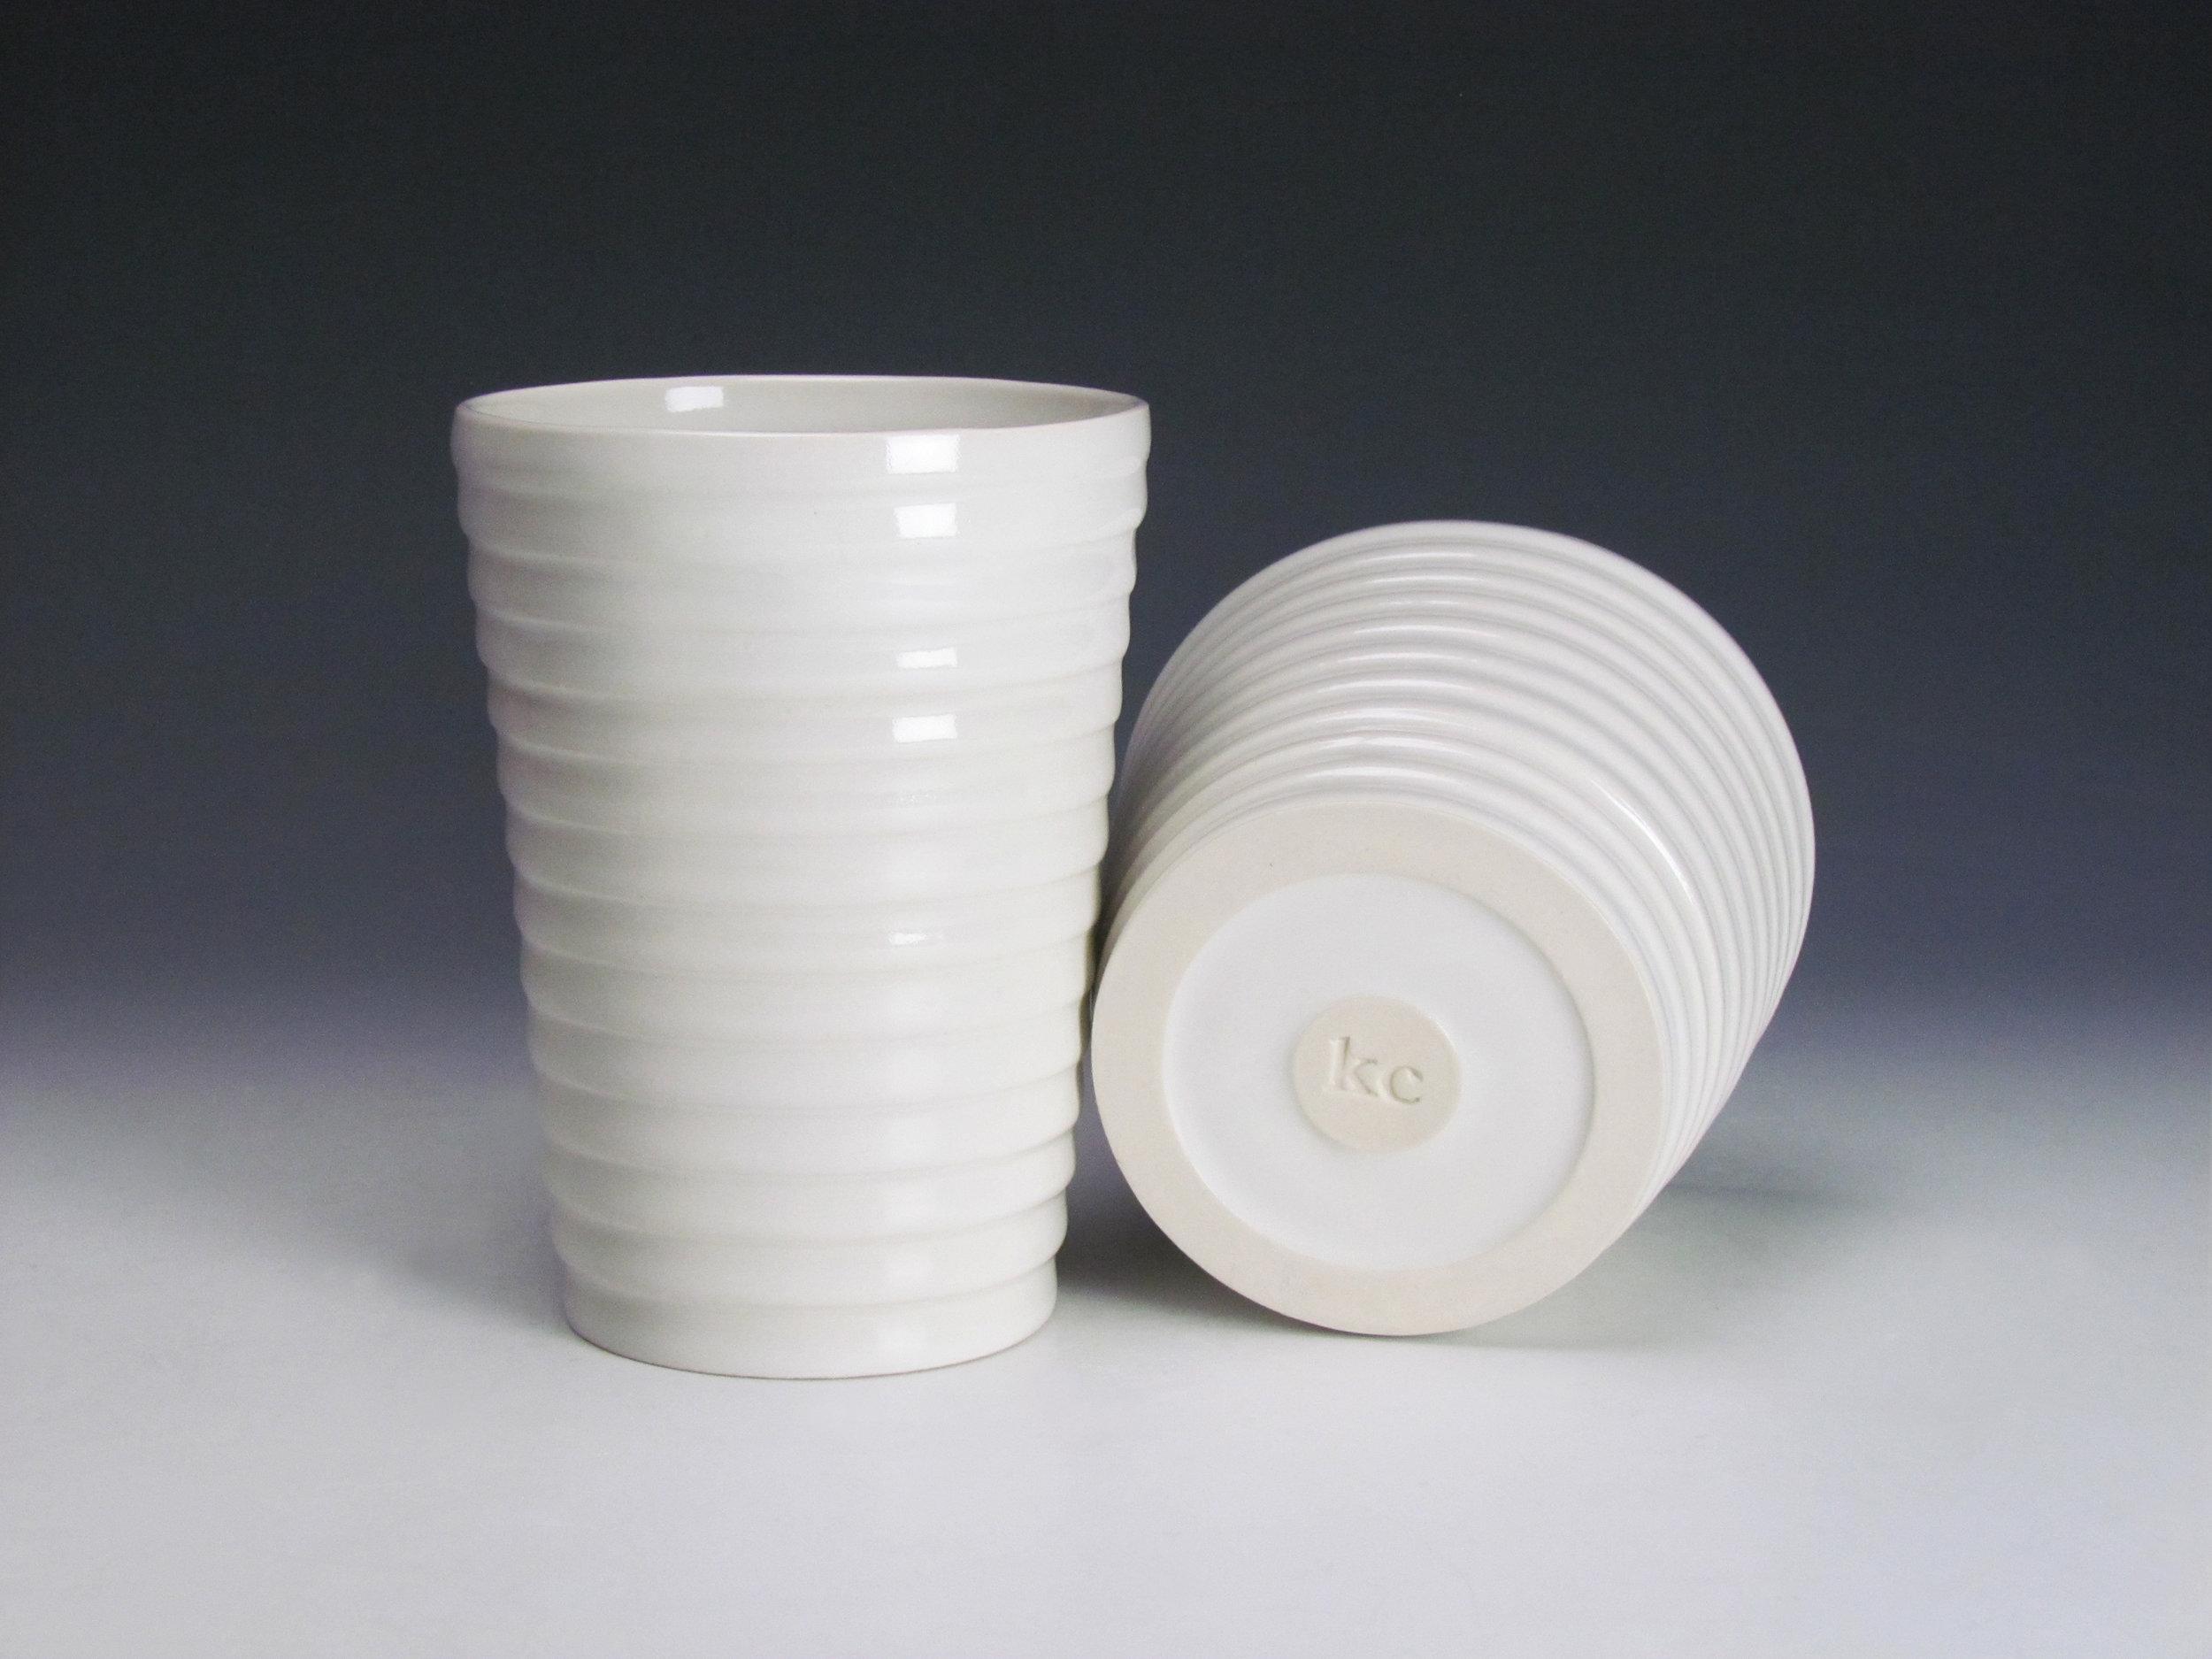 Tumblers (White)  |  Each: 7 x 3 x 3 inches  |  Porcelain, Glaze  |  2016